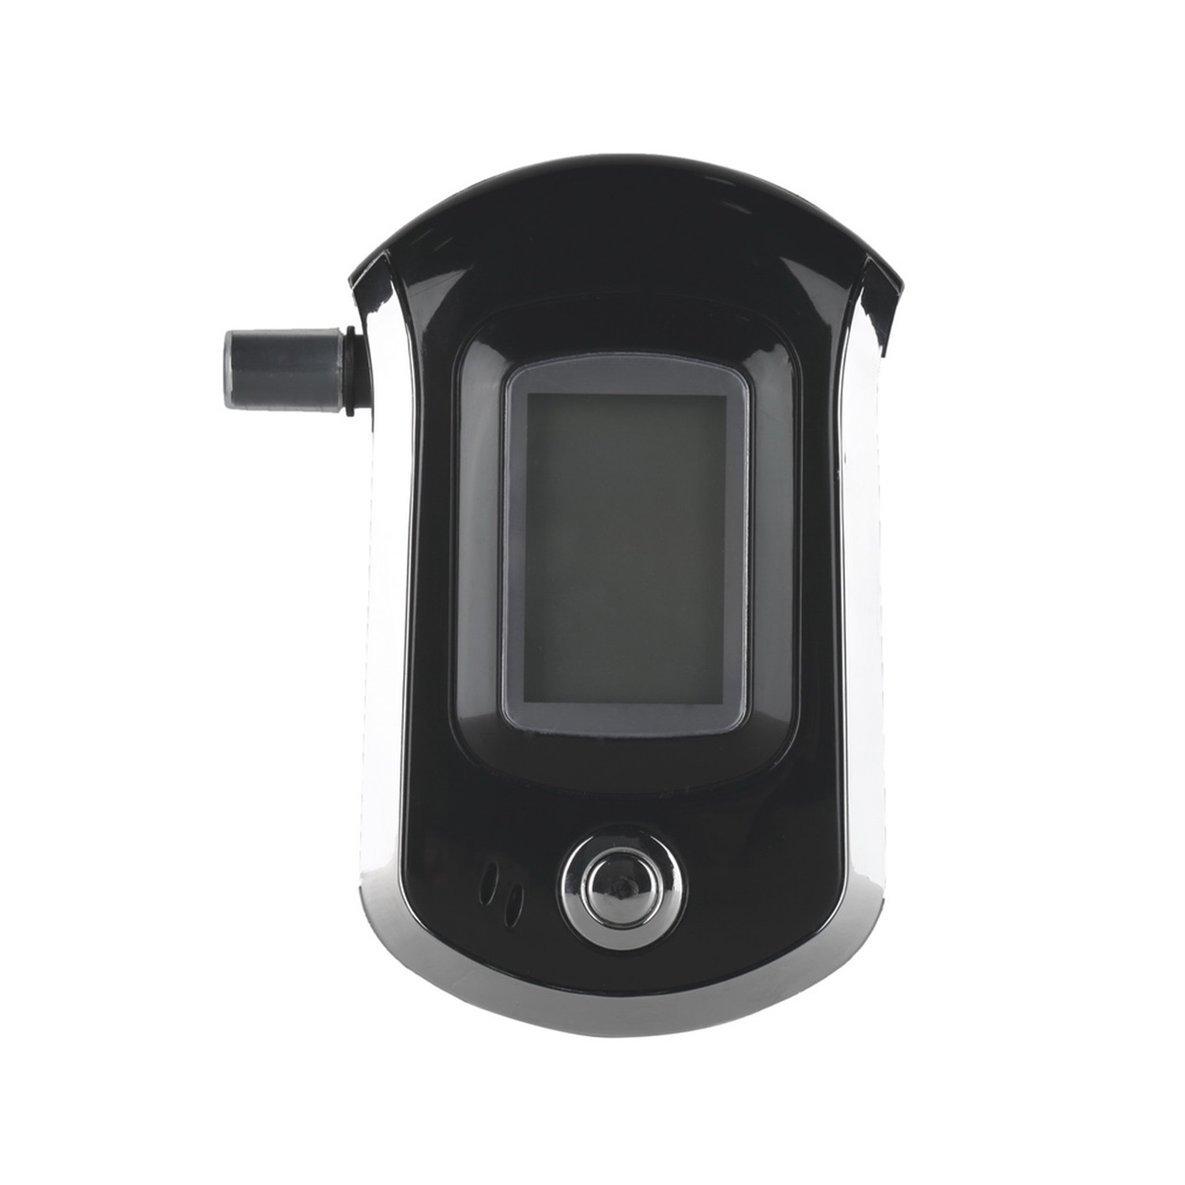 Noradtjcca Alkohol Tester Professionelle Digitale Alkoholtester Atemanalysator mit Gro/ßen Digitalen LCD-Display 5 St/ücke Mundst/ücke